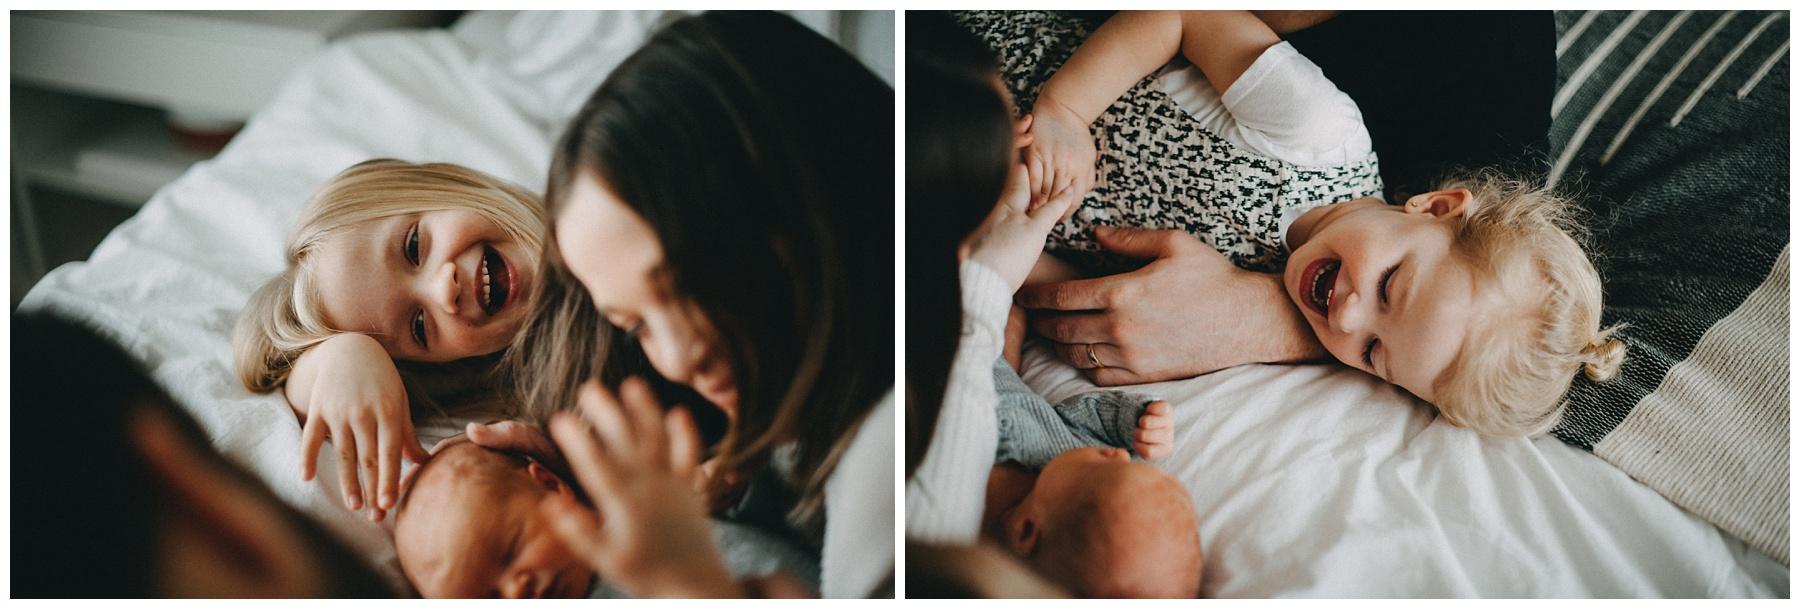 Vancouver newborn Baby photographer_0677.jpg